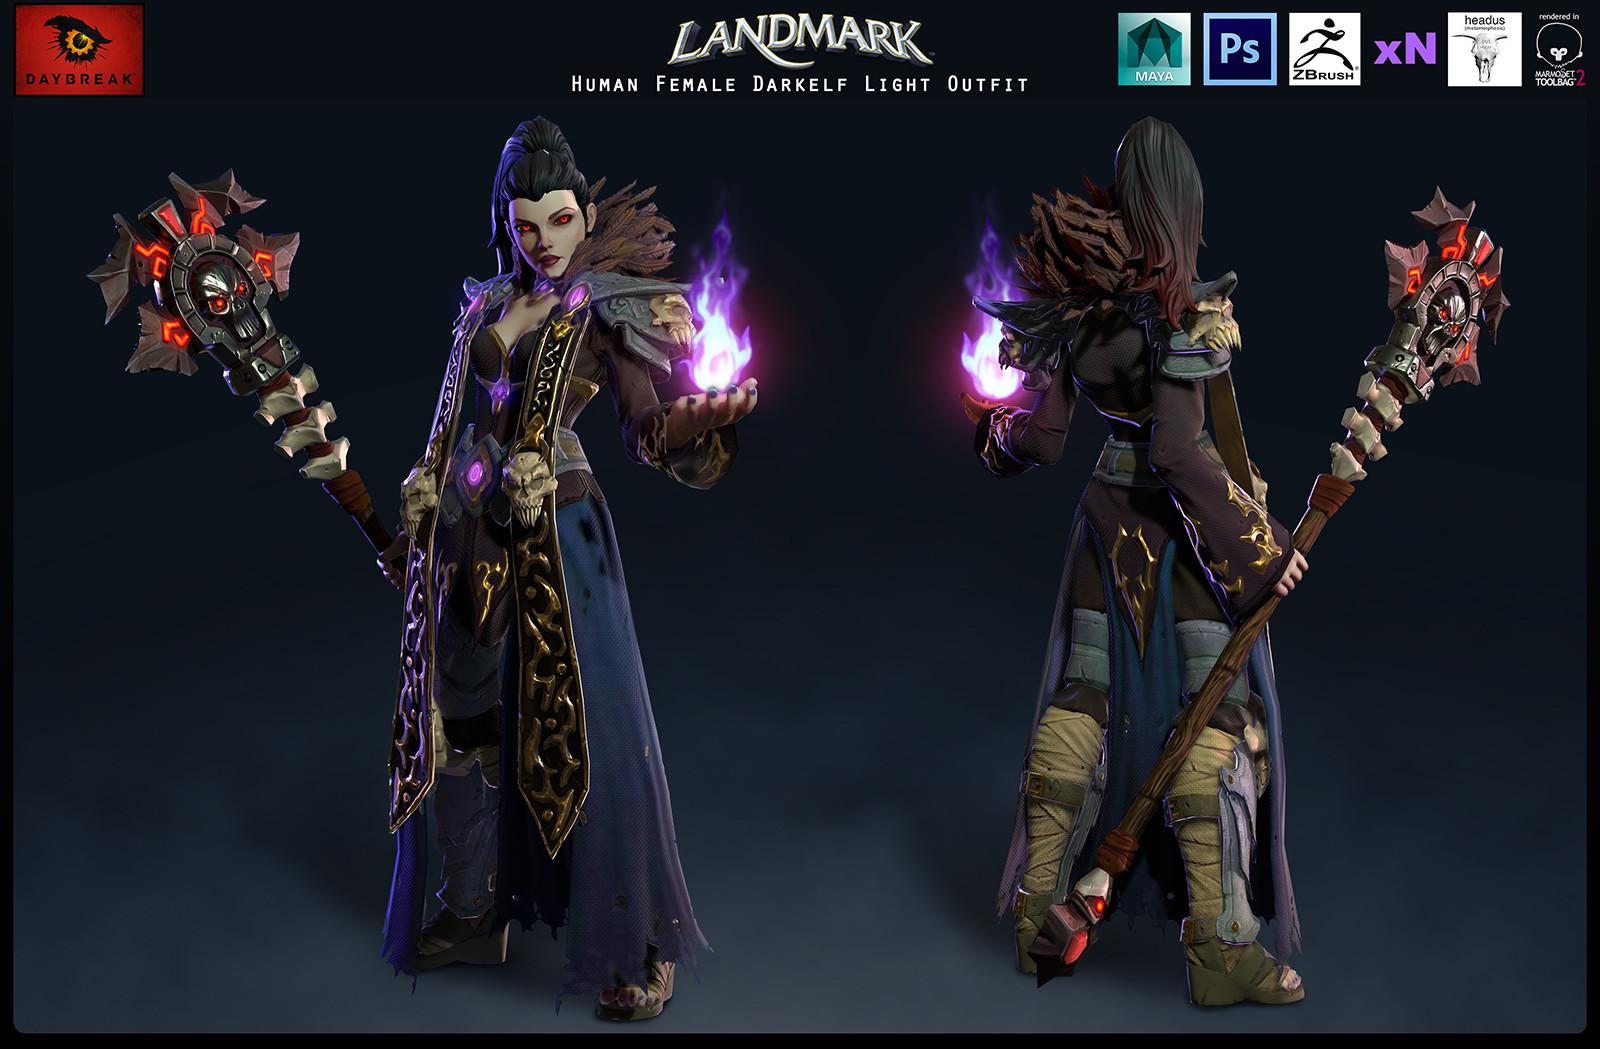 Human Female Darkelf Light Outfit